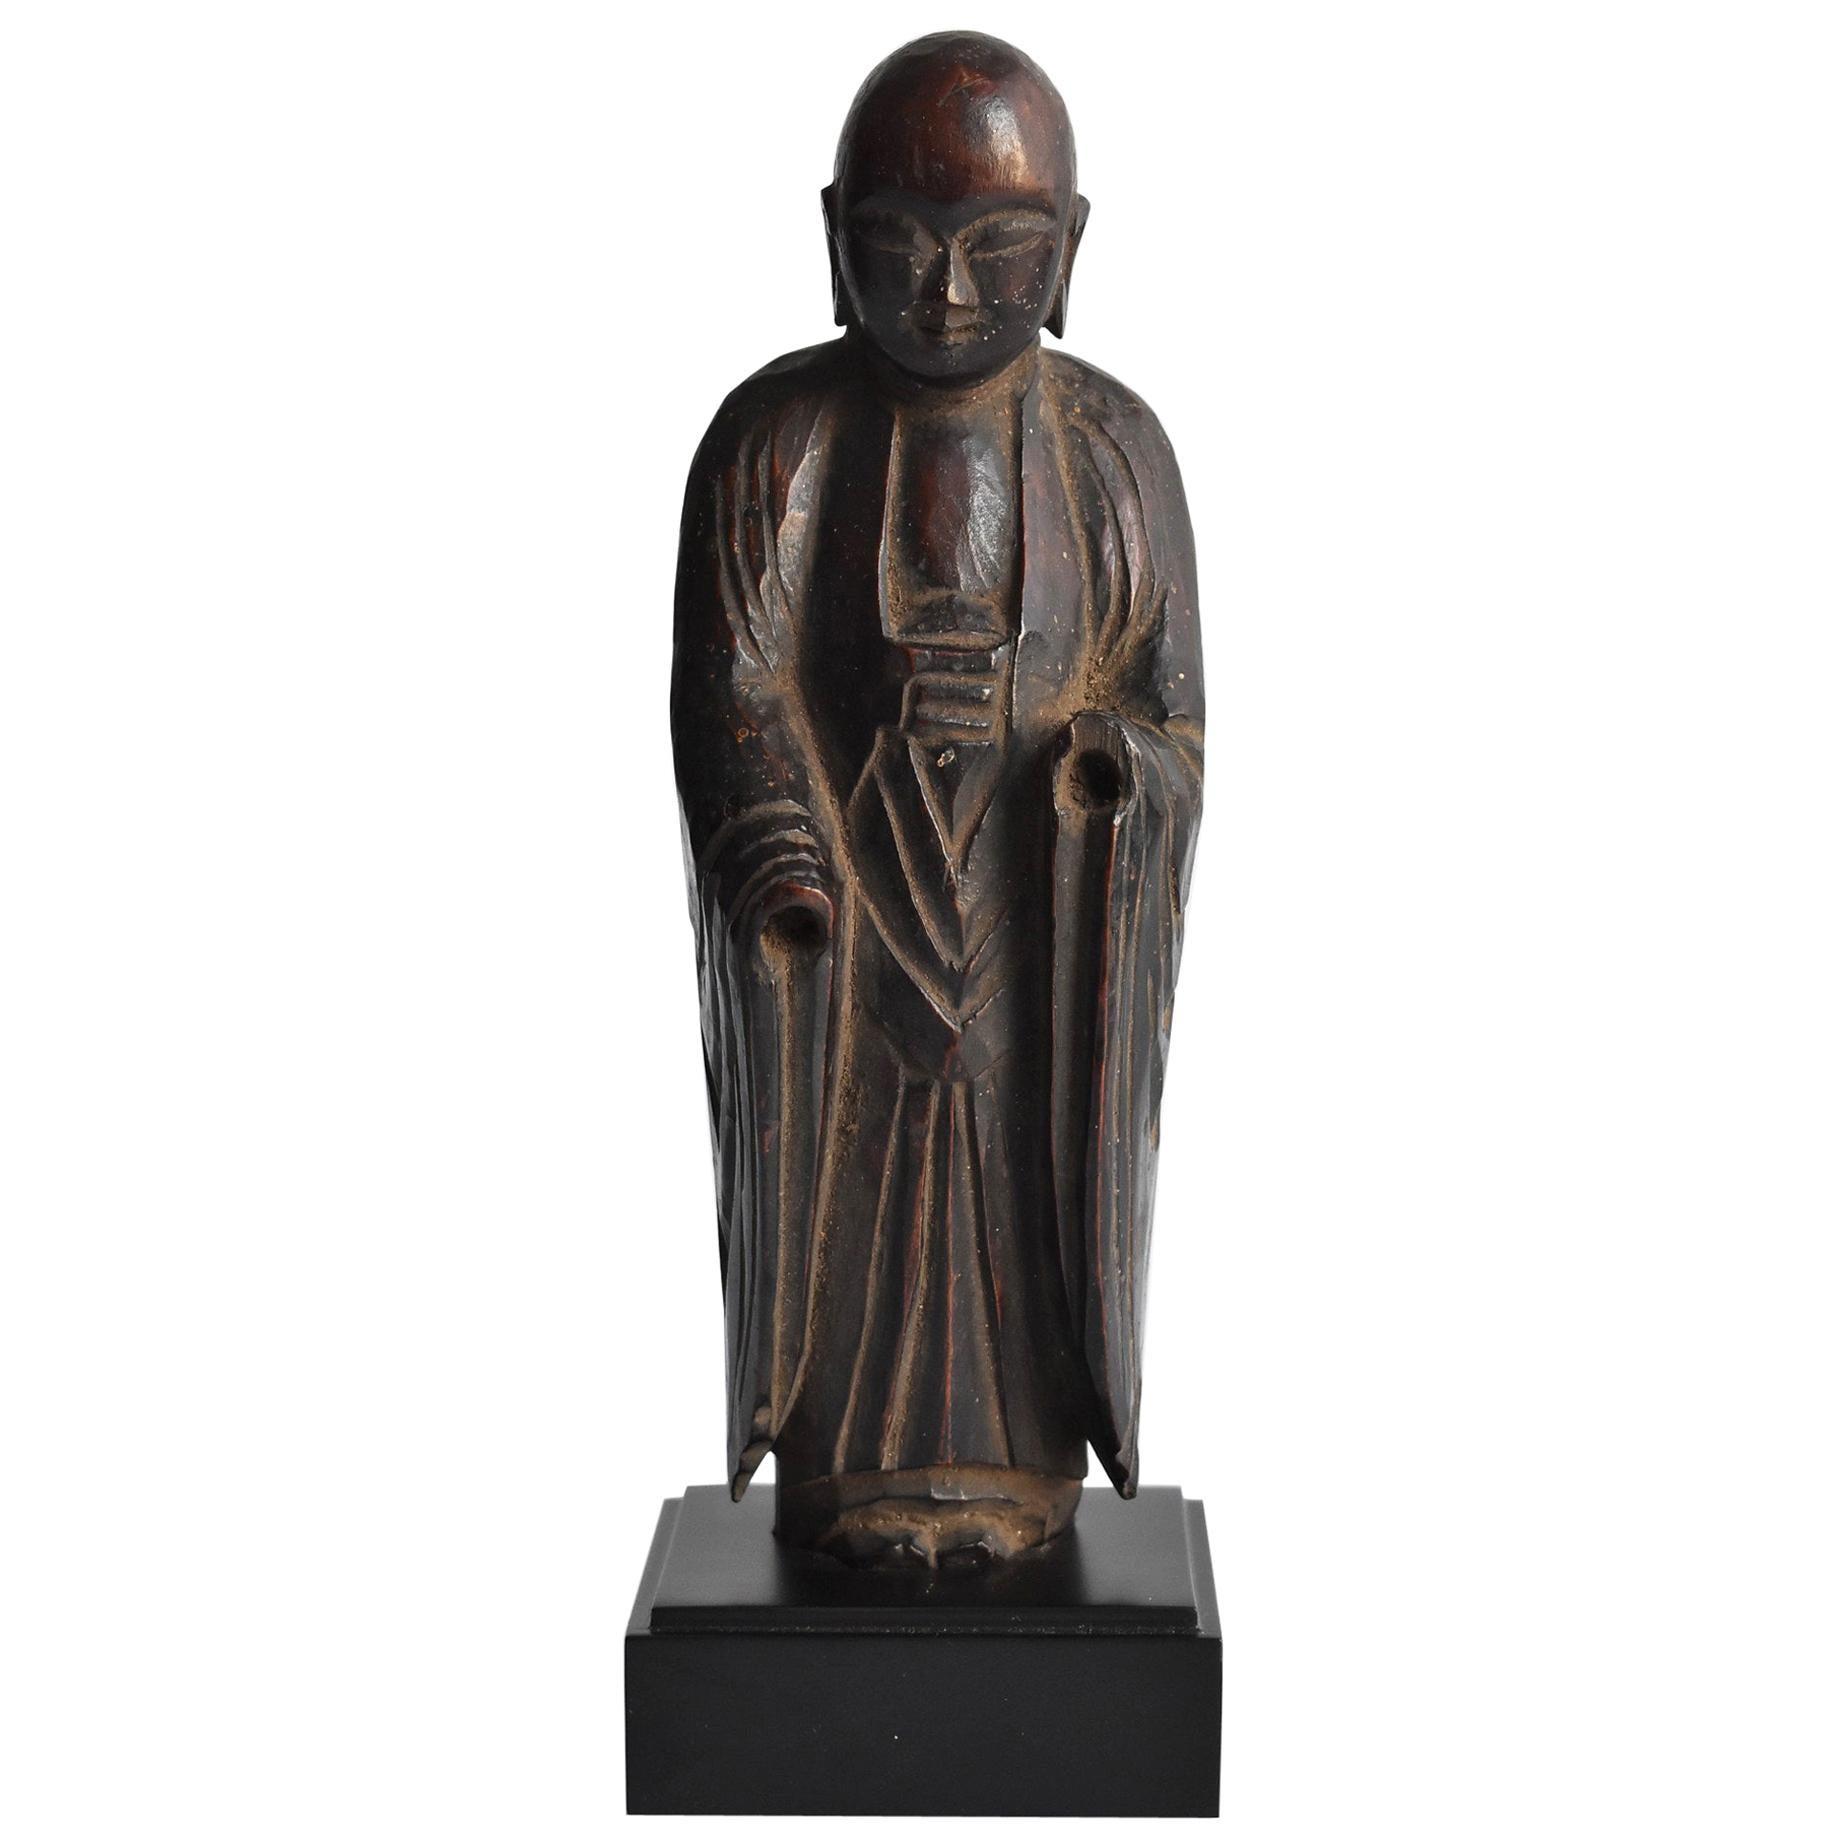 1600s-1800s Japanese Wood Carving Jizo Bodhisattva or Buddha Statue Edo Period